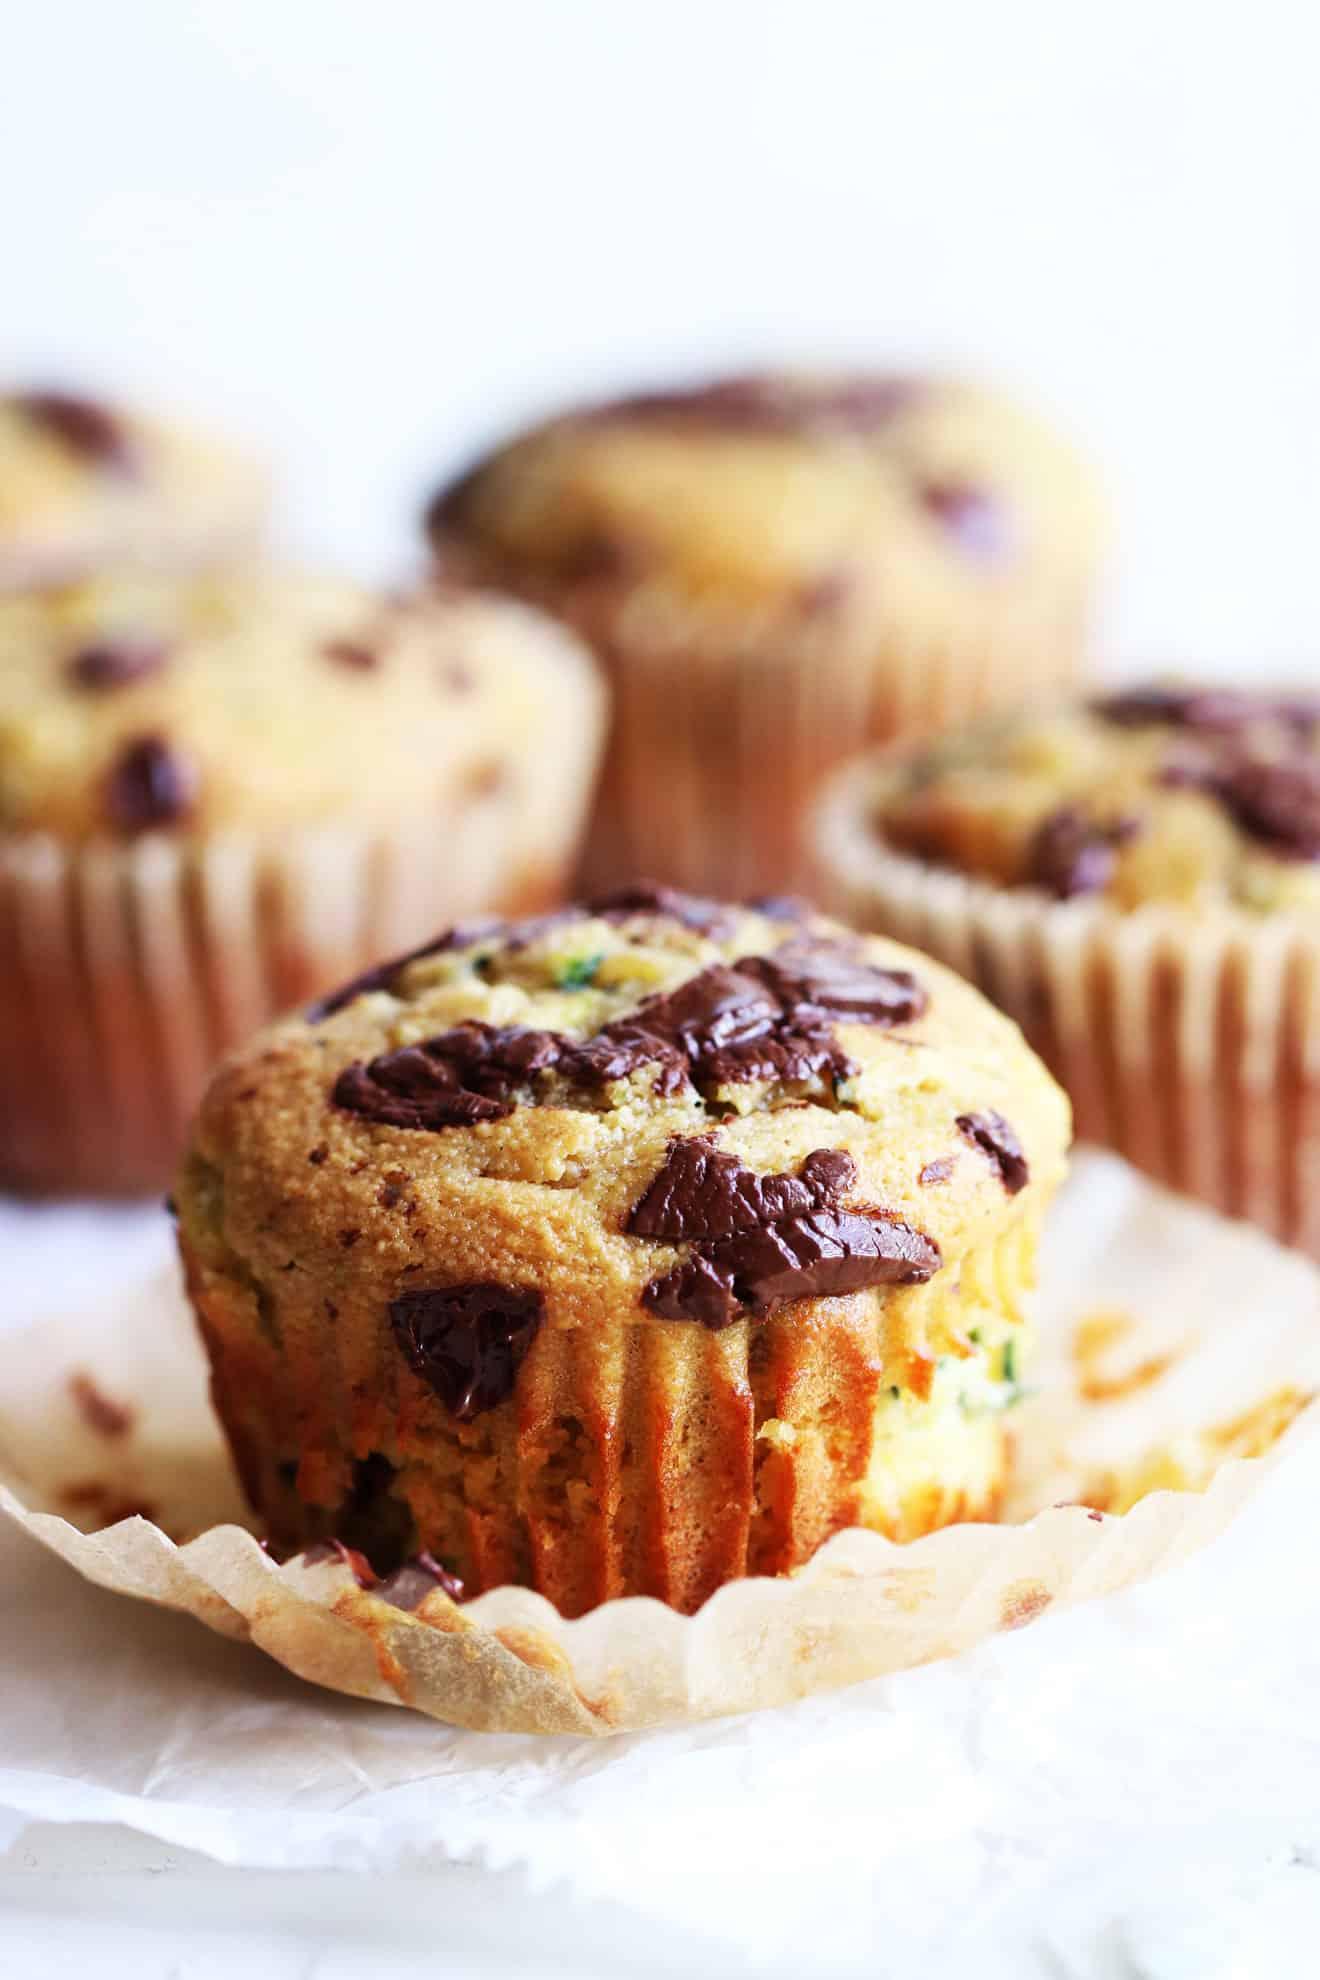 Almond Flour Chocolate Chip Zucchini Muffins